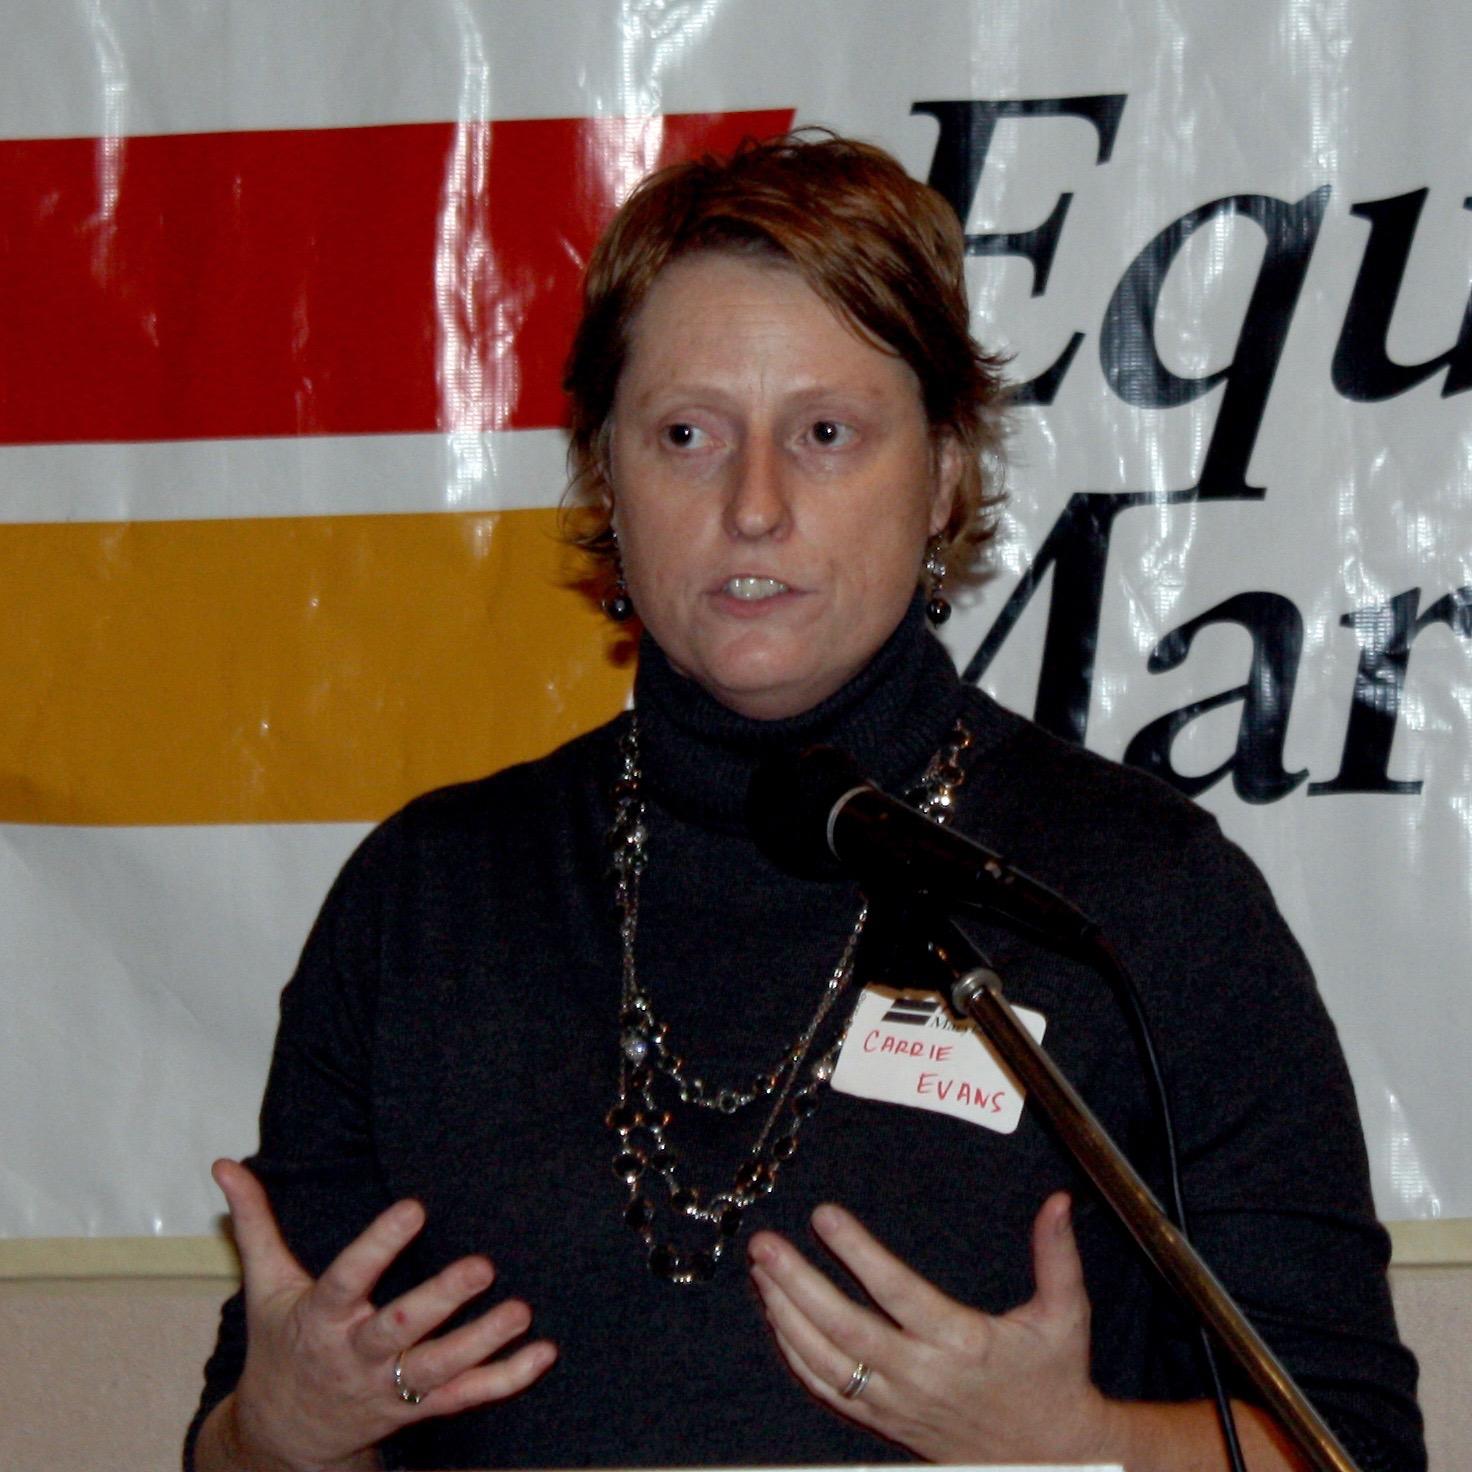 Evans 2011